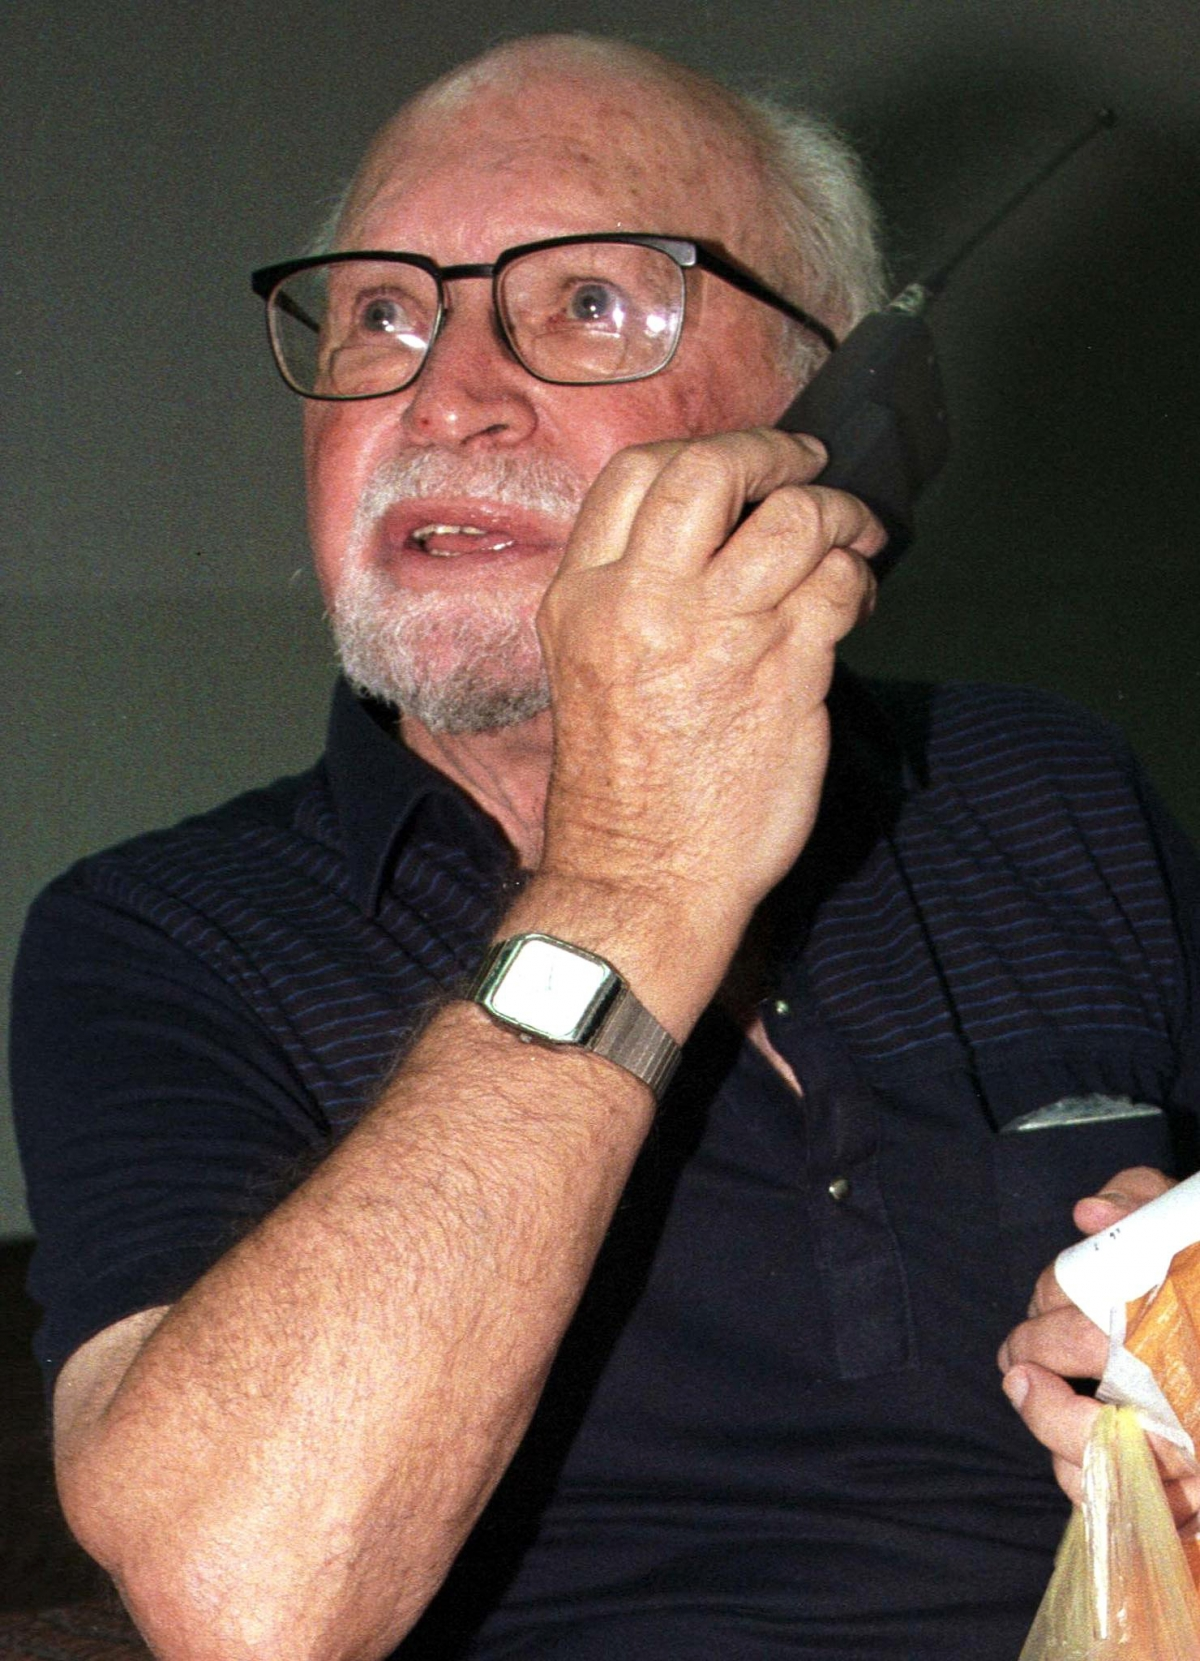 Marcus Klinberg